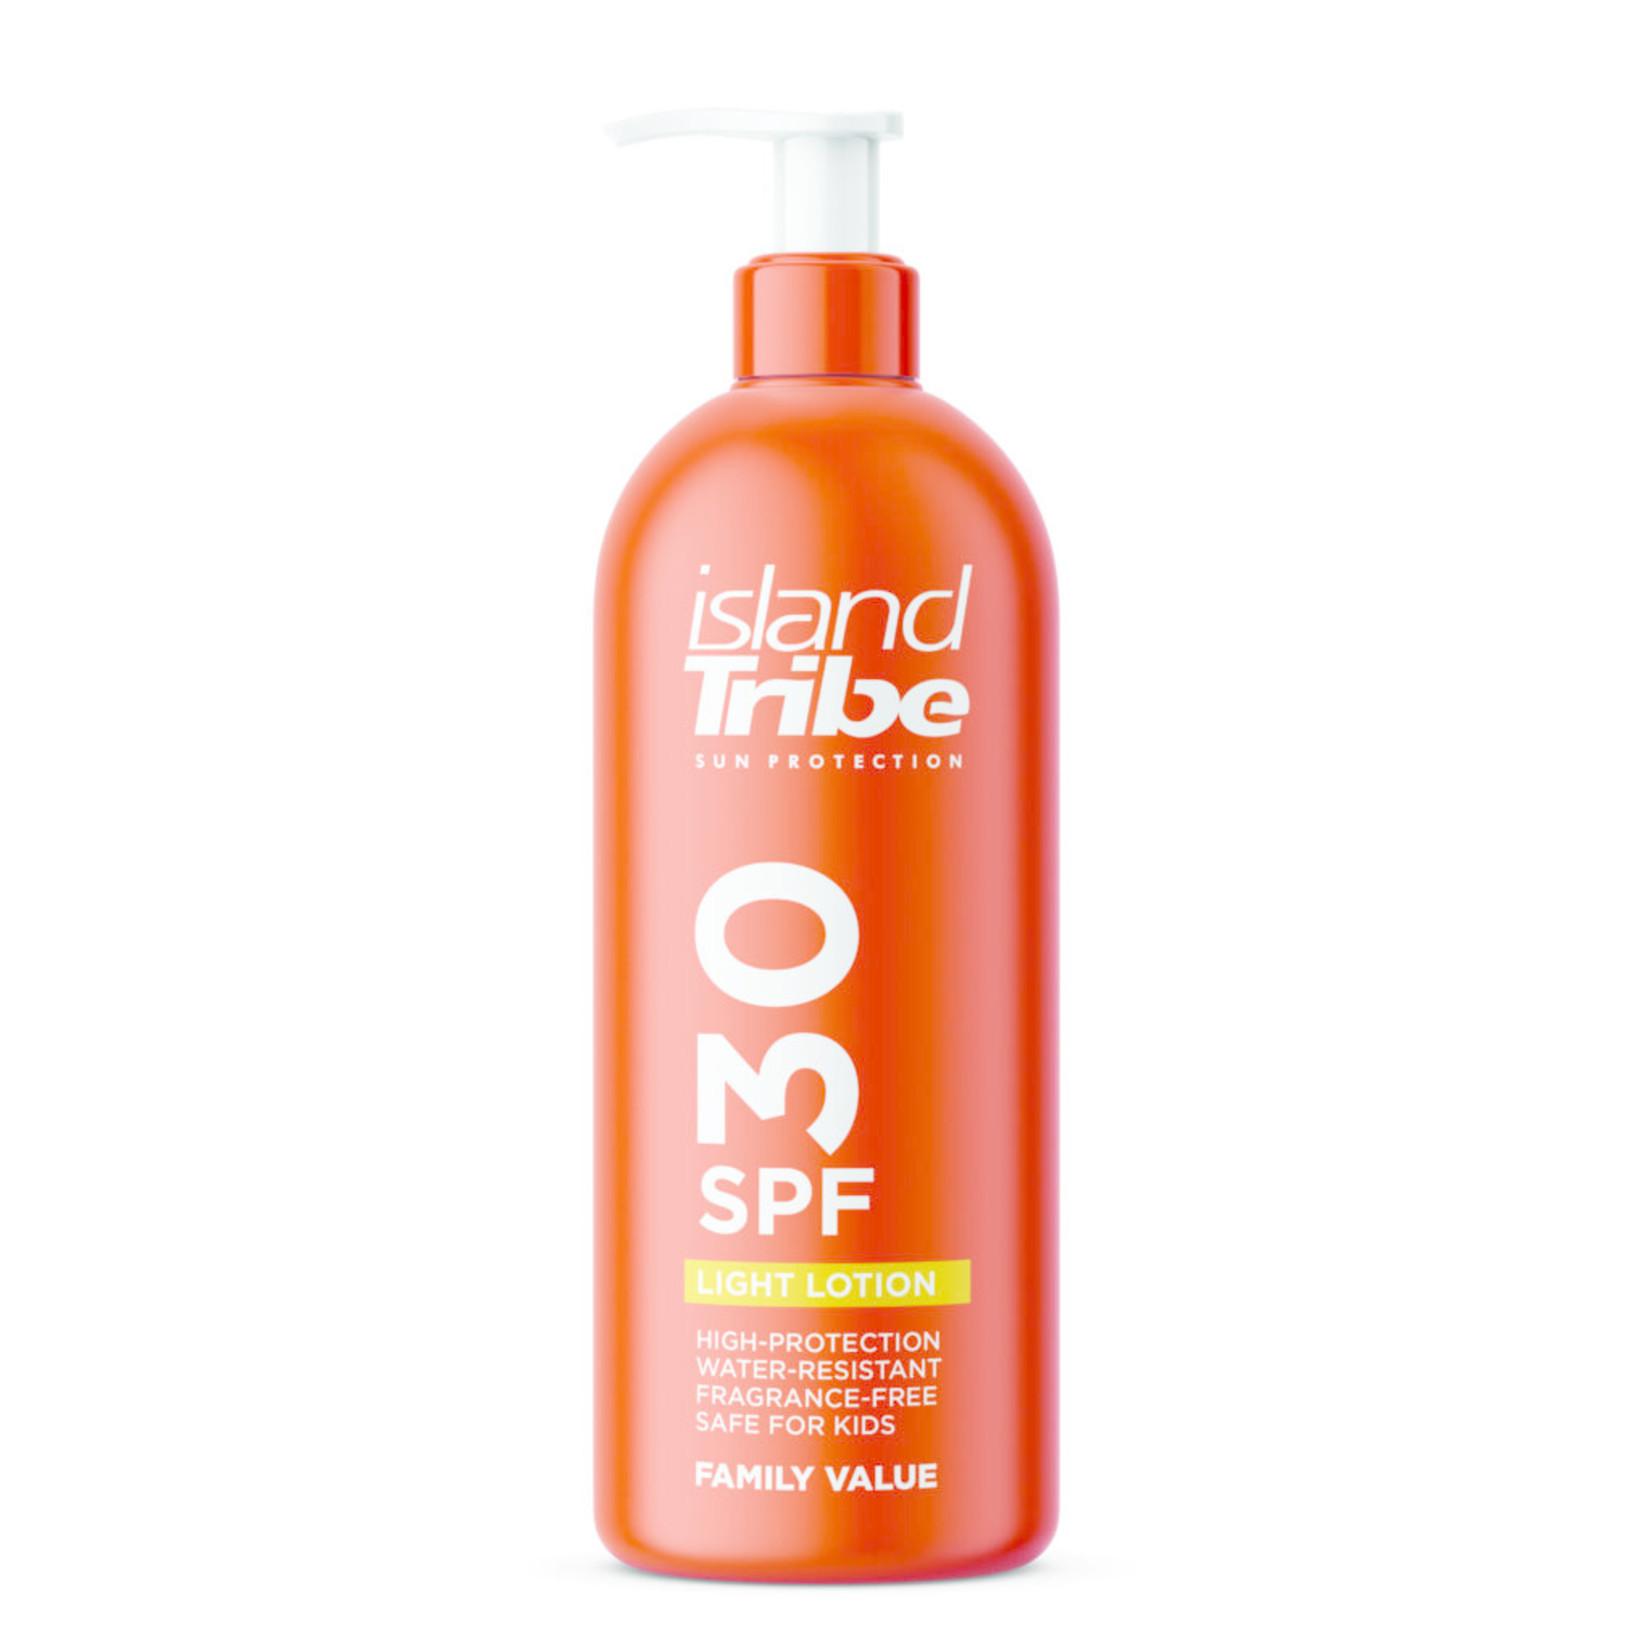 IslandTribe SPF 30 light lotion dispencer 450ml